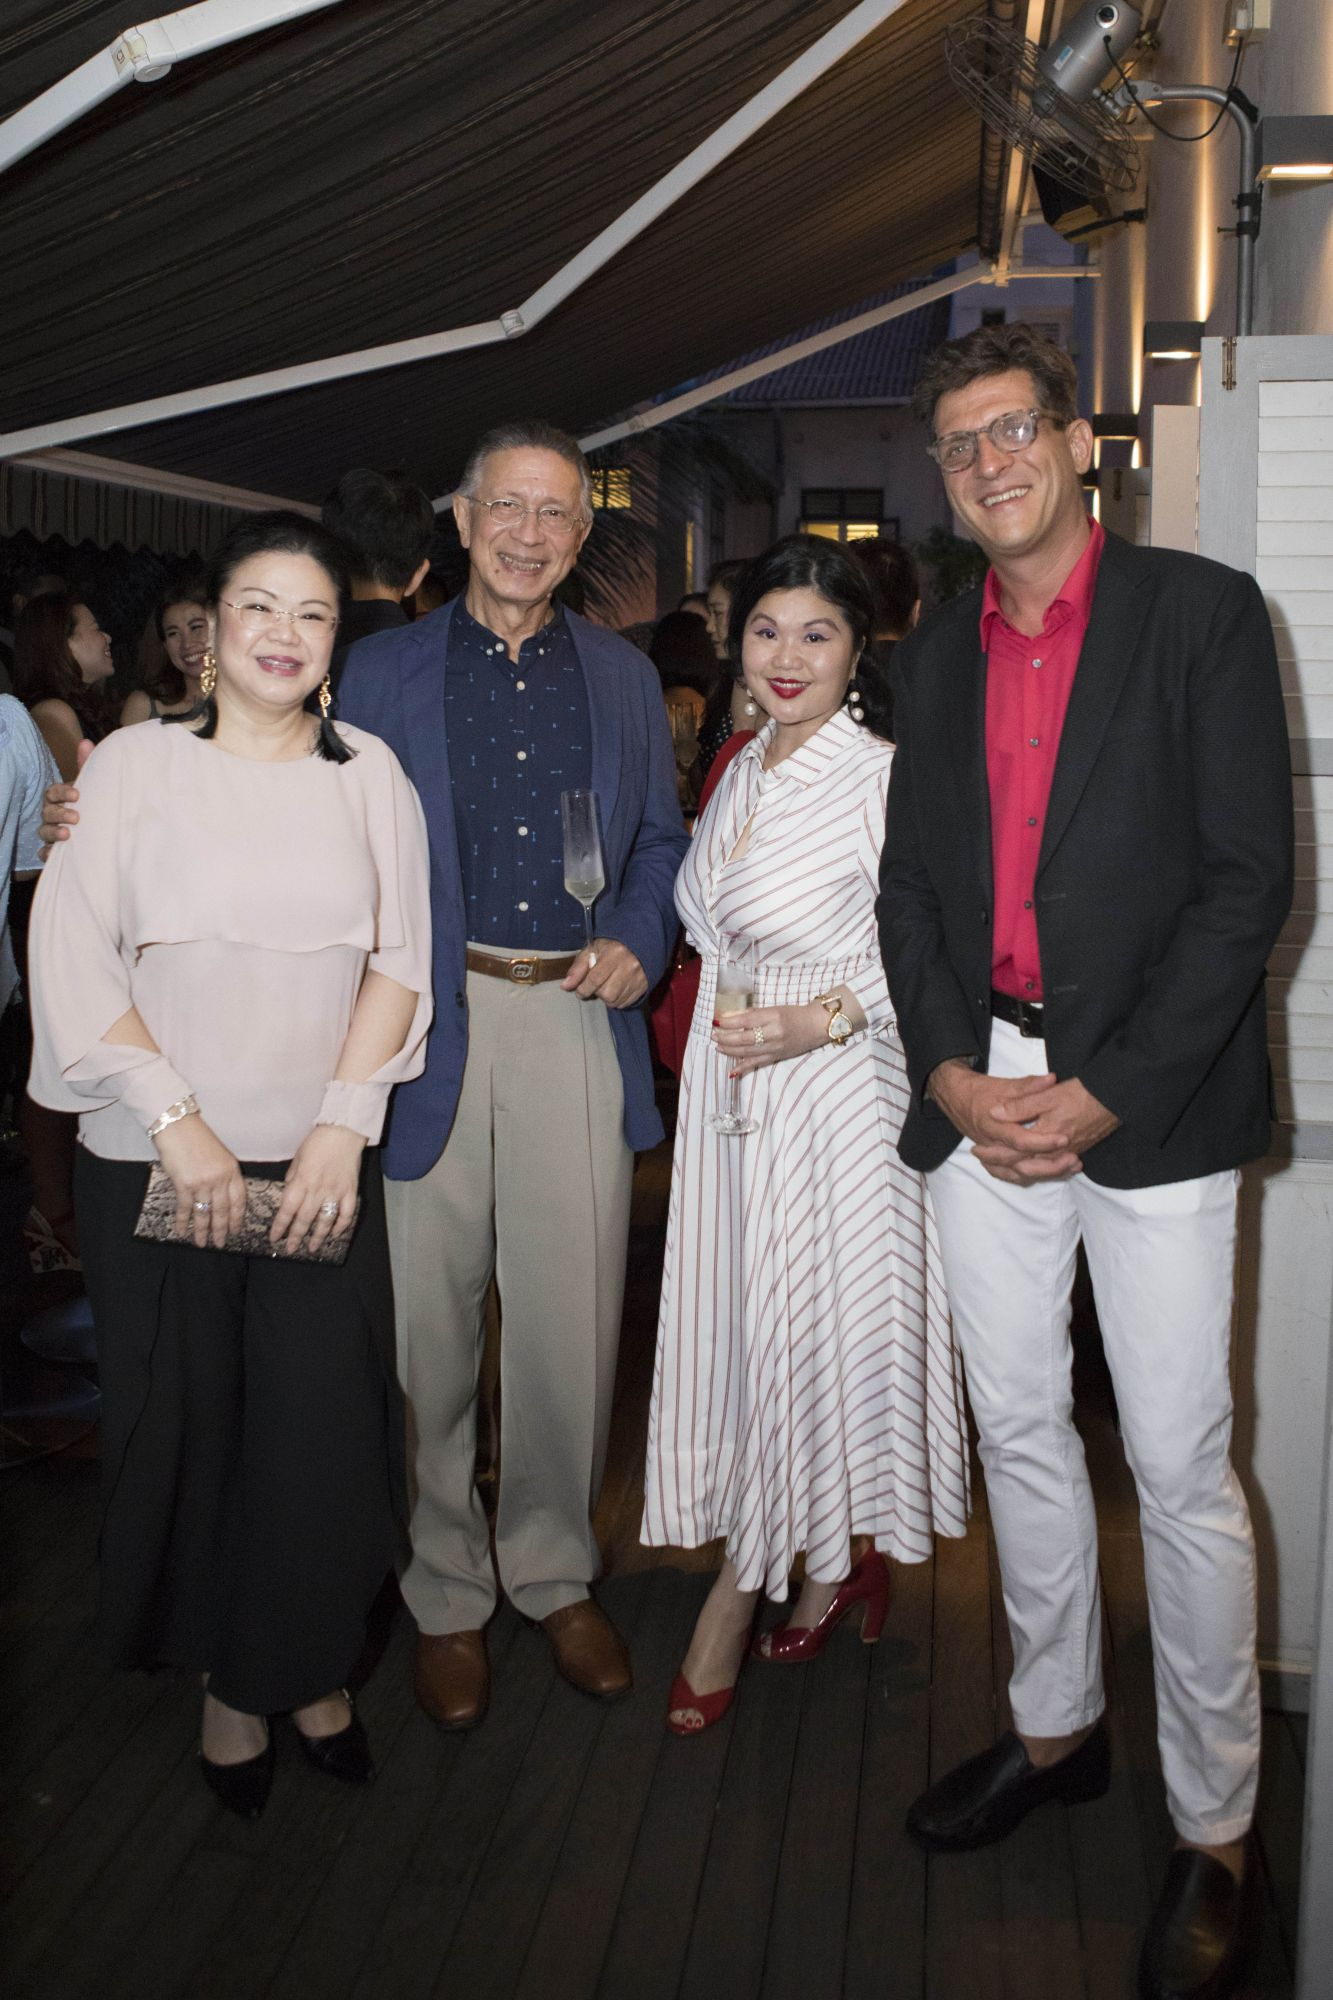 Lam Min Yee, Lawrence Basapa, Lam Tse Yi, Hannes Hentze